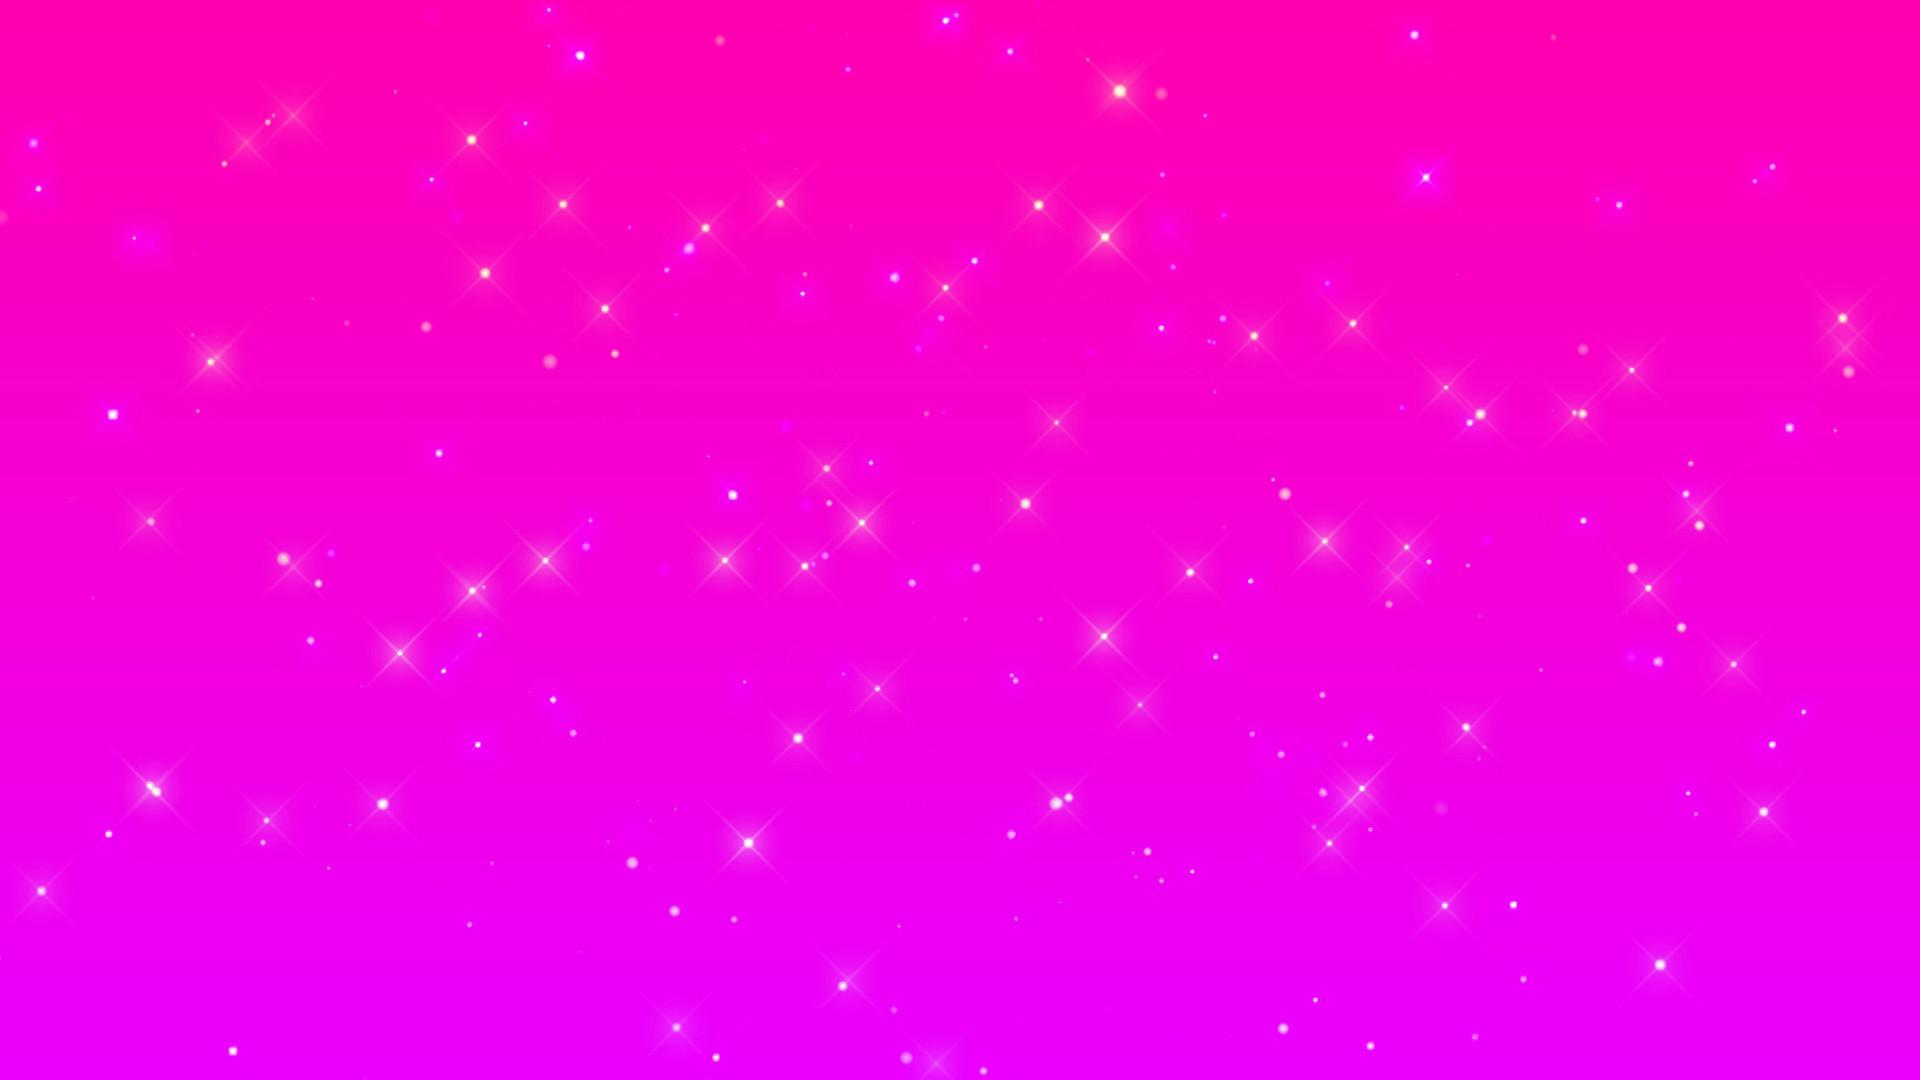 1920x1200 Pink Background Download Hd Digital Wallpaper